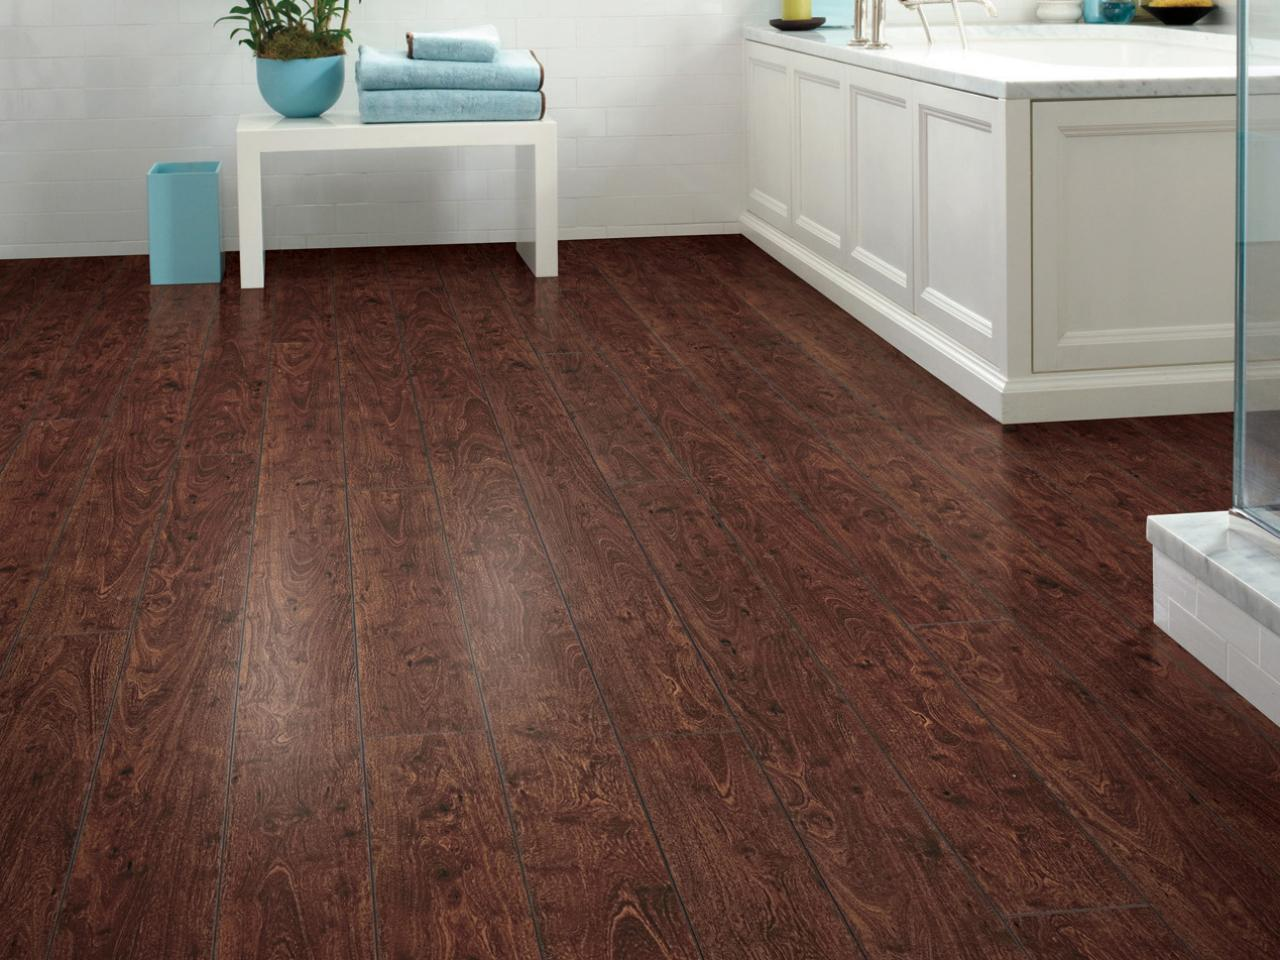 Best Why You Should Choose Laminate bathroom laminate flooring